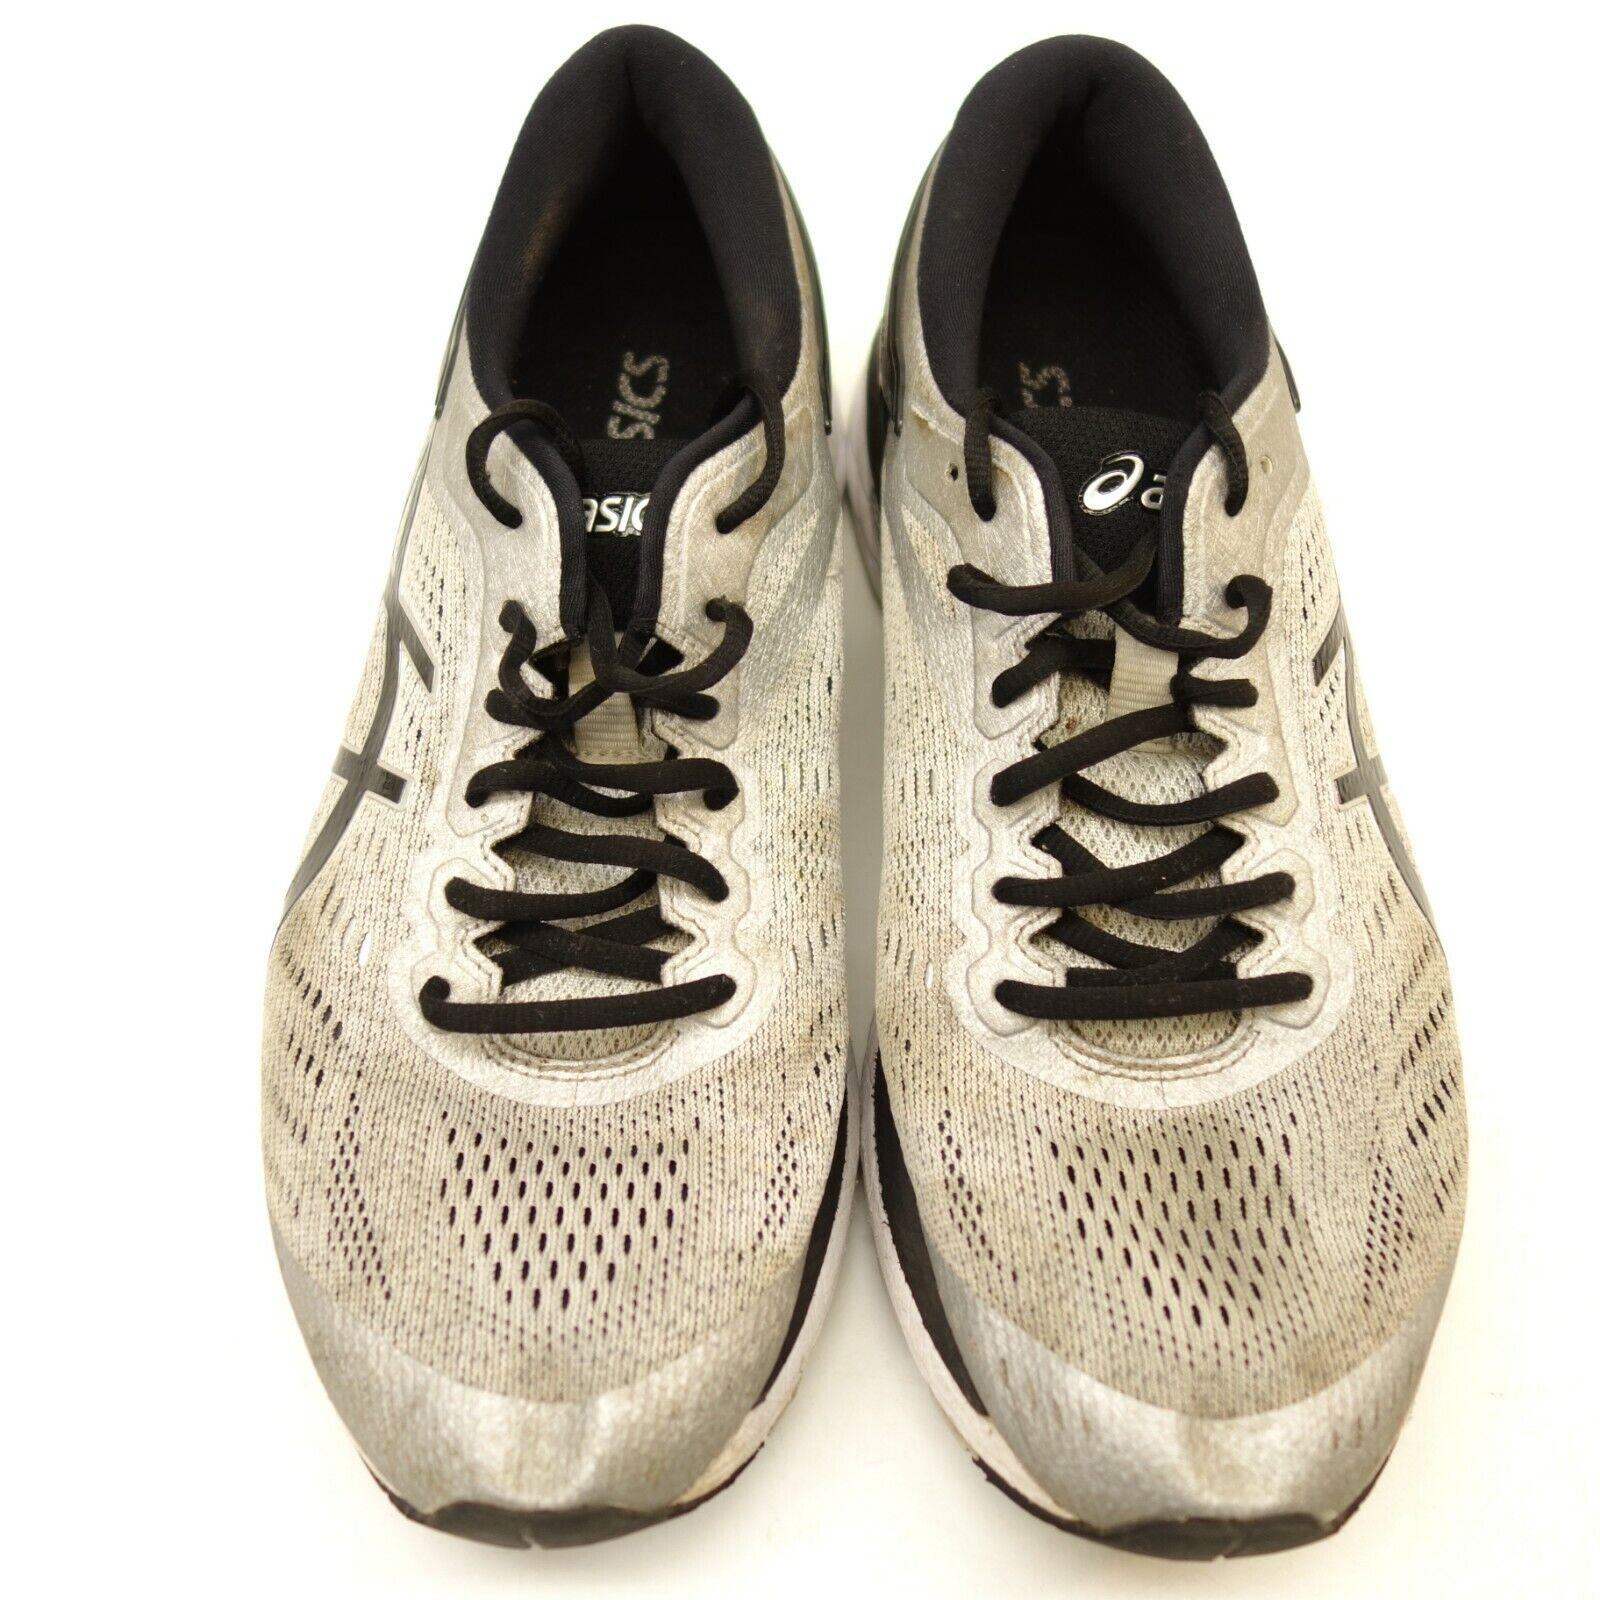 Asics US 9.5 EU 43.5 Mens Gel-Kayano 24 T749N Athletic Training Running shoes